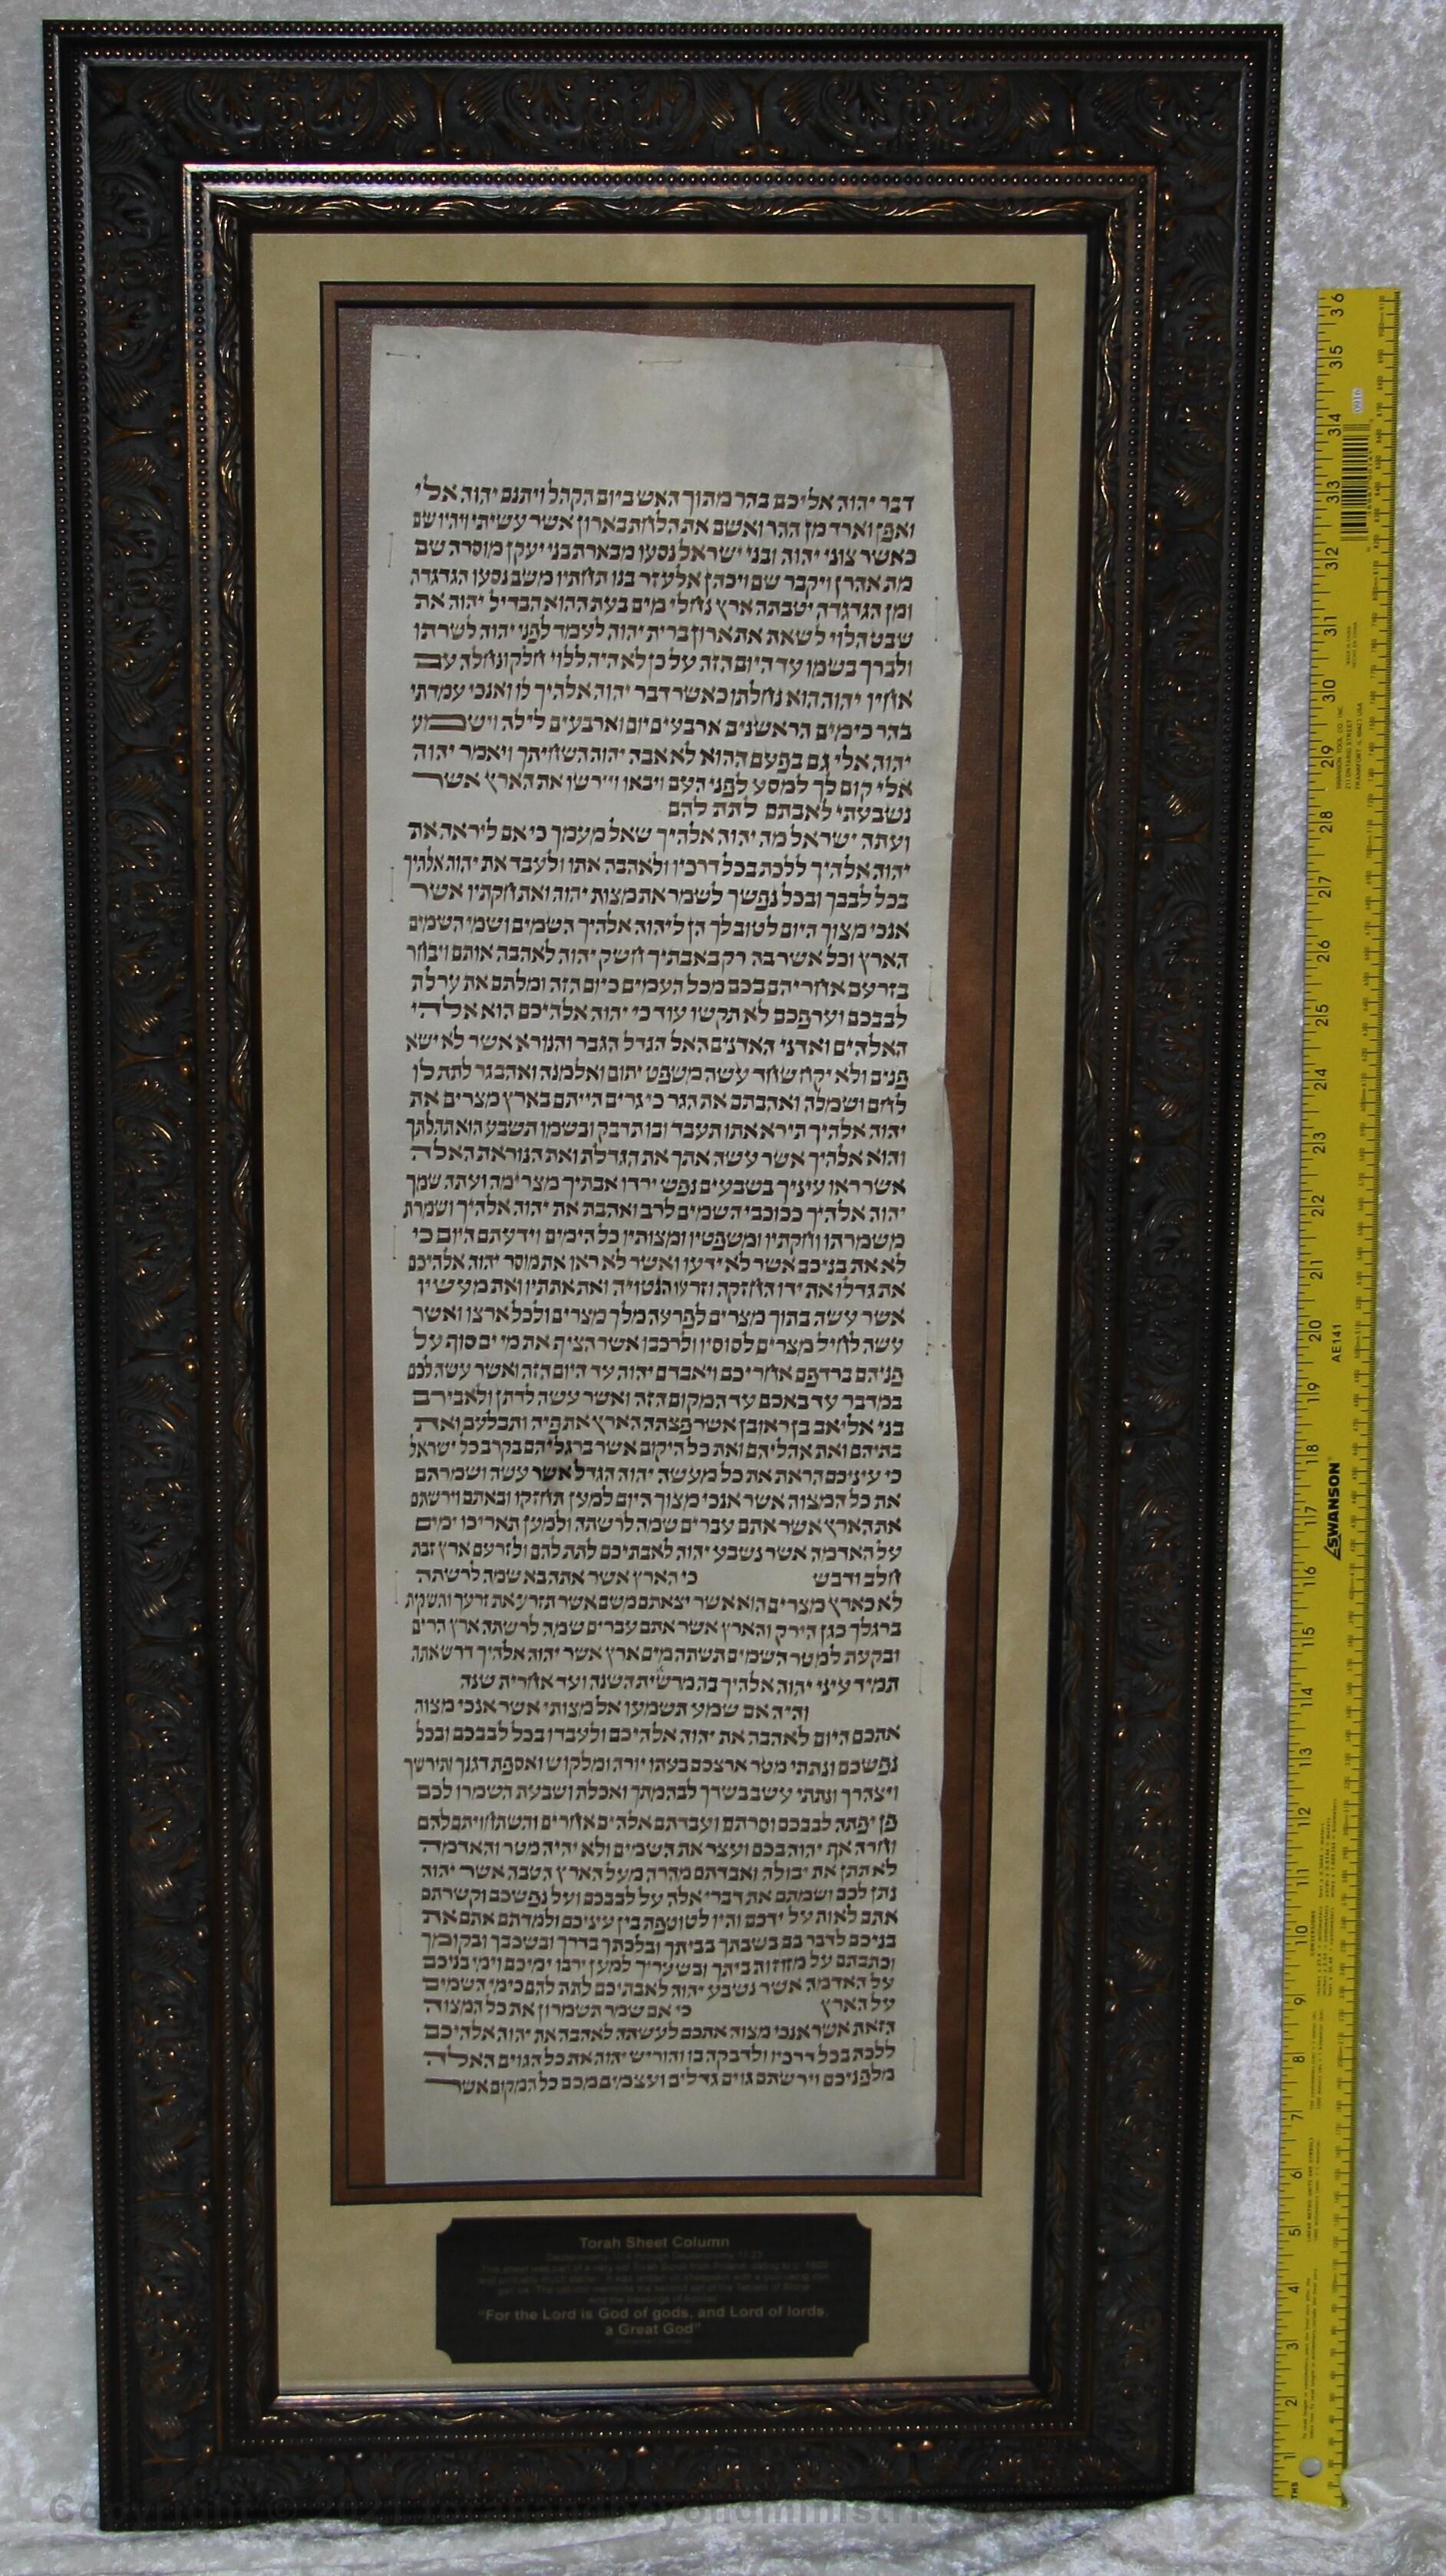 Torah Sheet Column Deuteronomy 10:4 through Deuteronomy 11:23